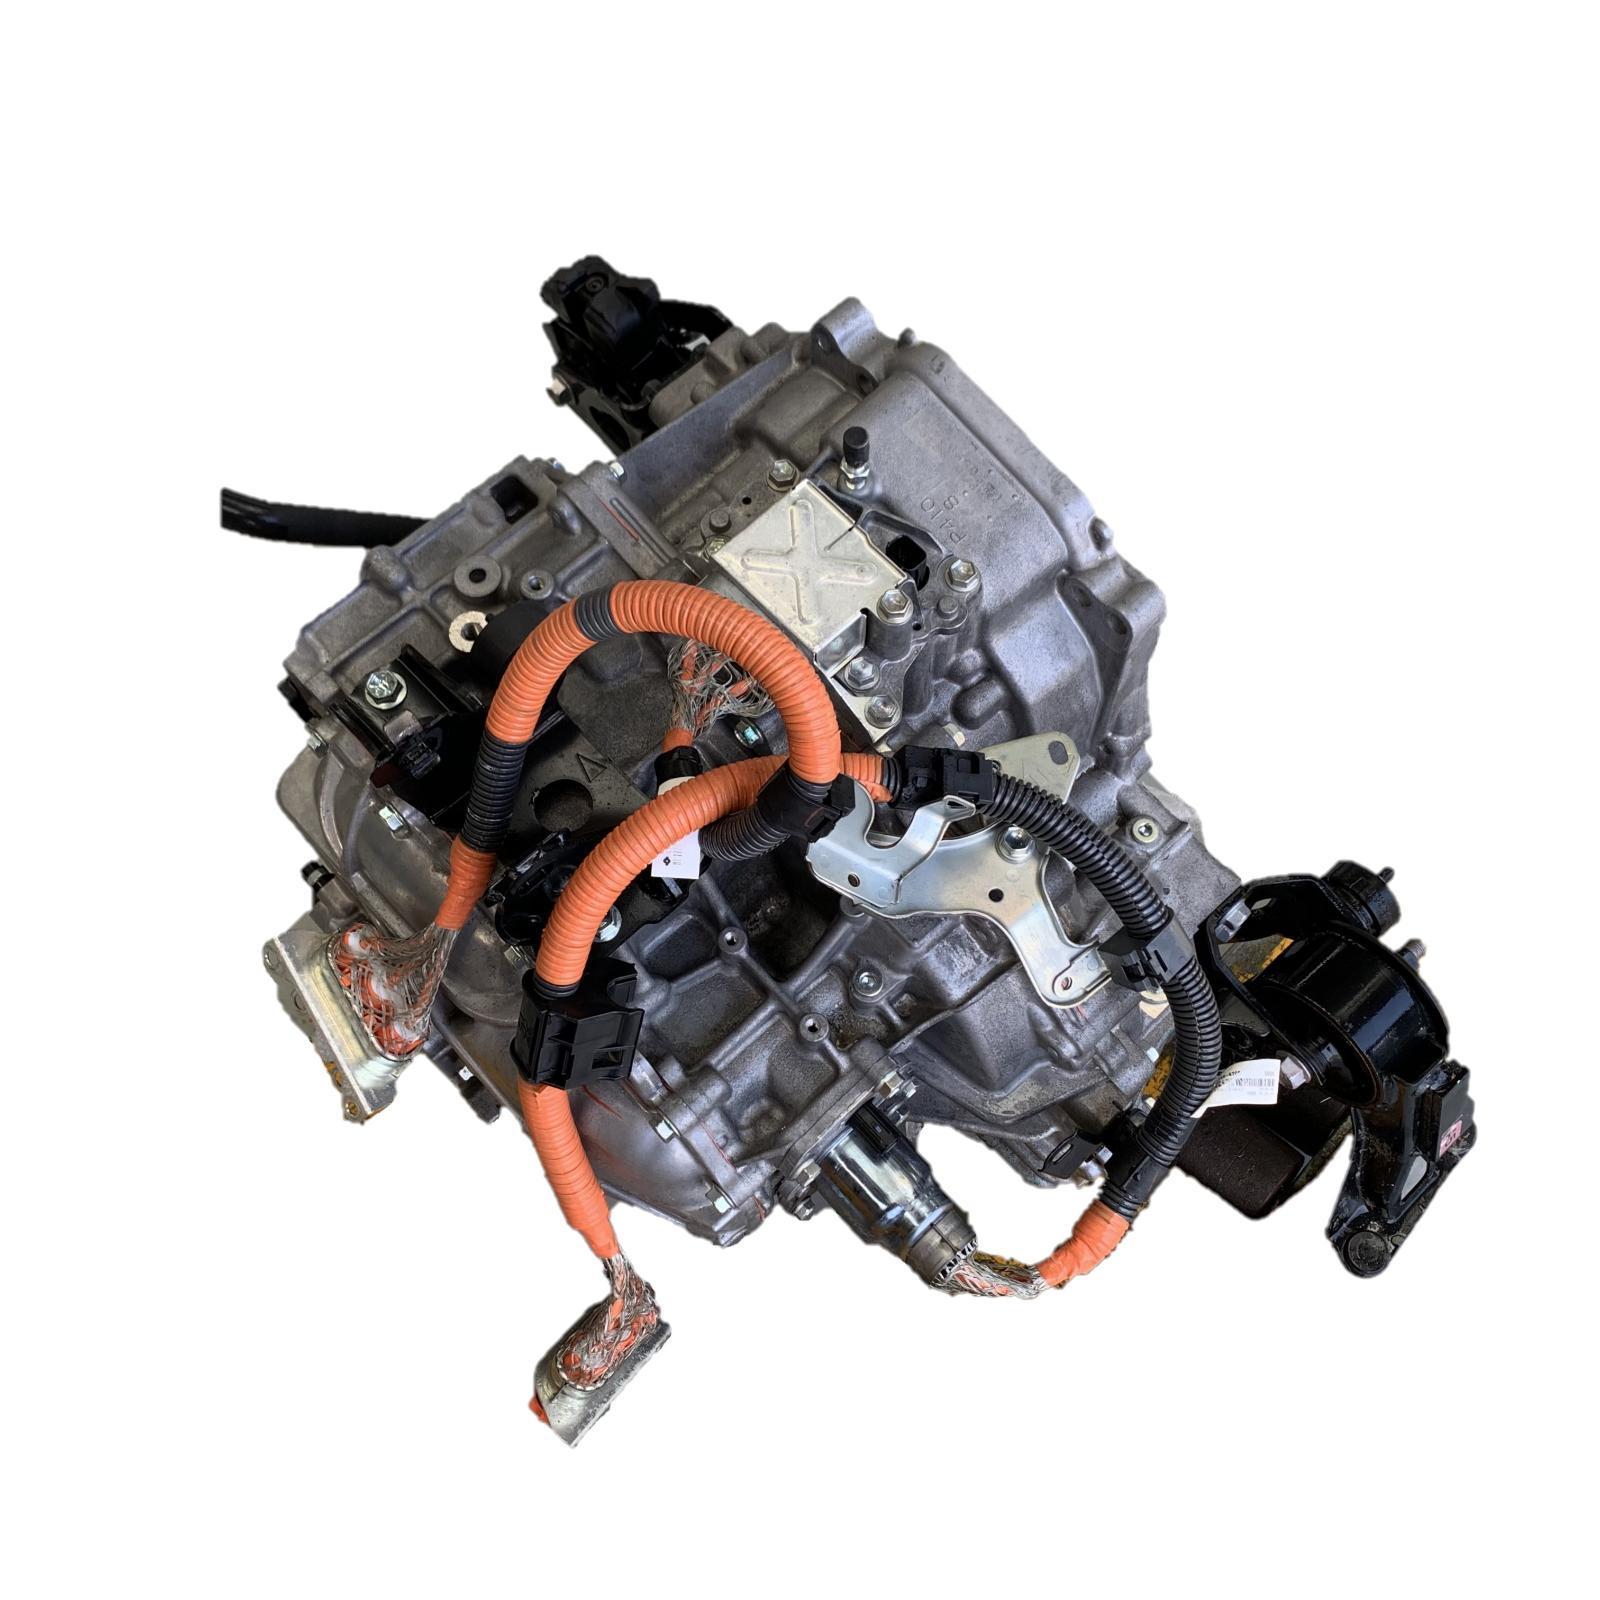 TOYOTA COROLLA, Trans/Gearbox, AUTO, PETROL, 1.8, 2ZR-FXE, HYBRID, ZWE186R, 06/16-